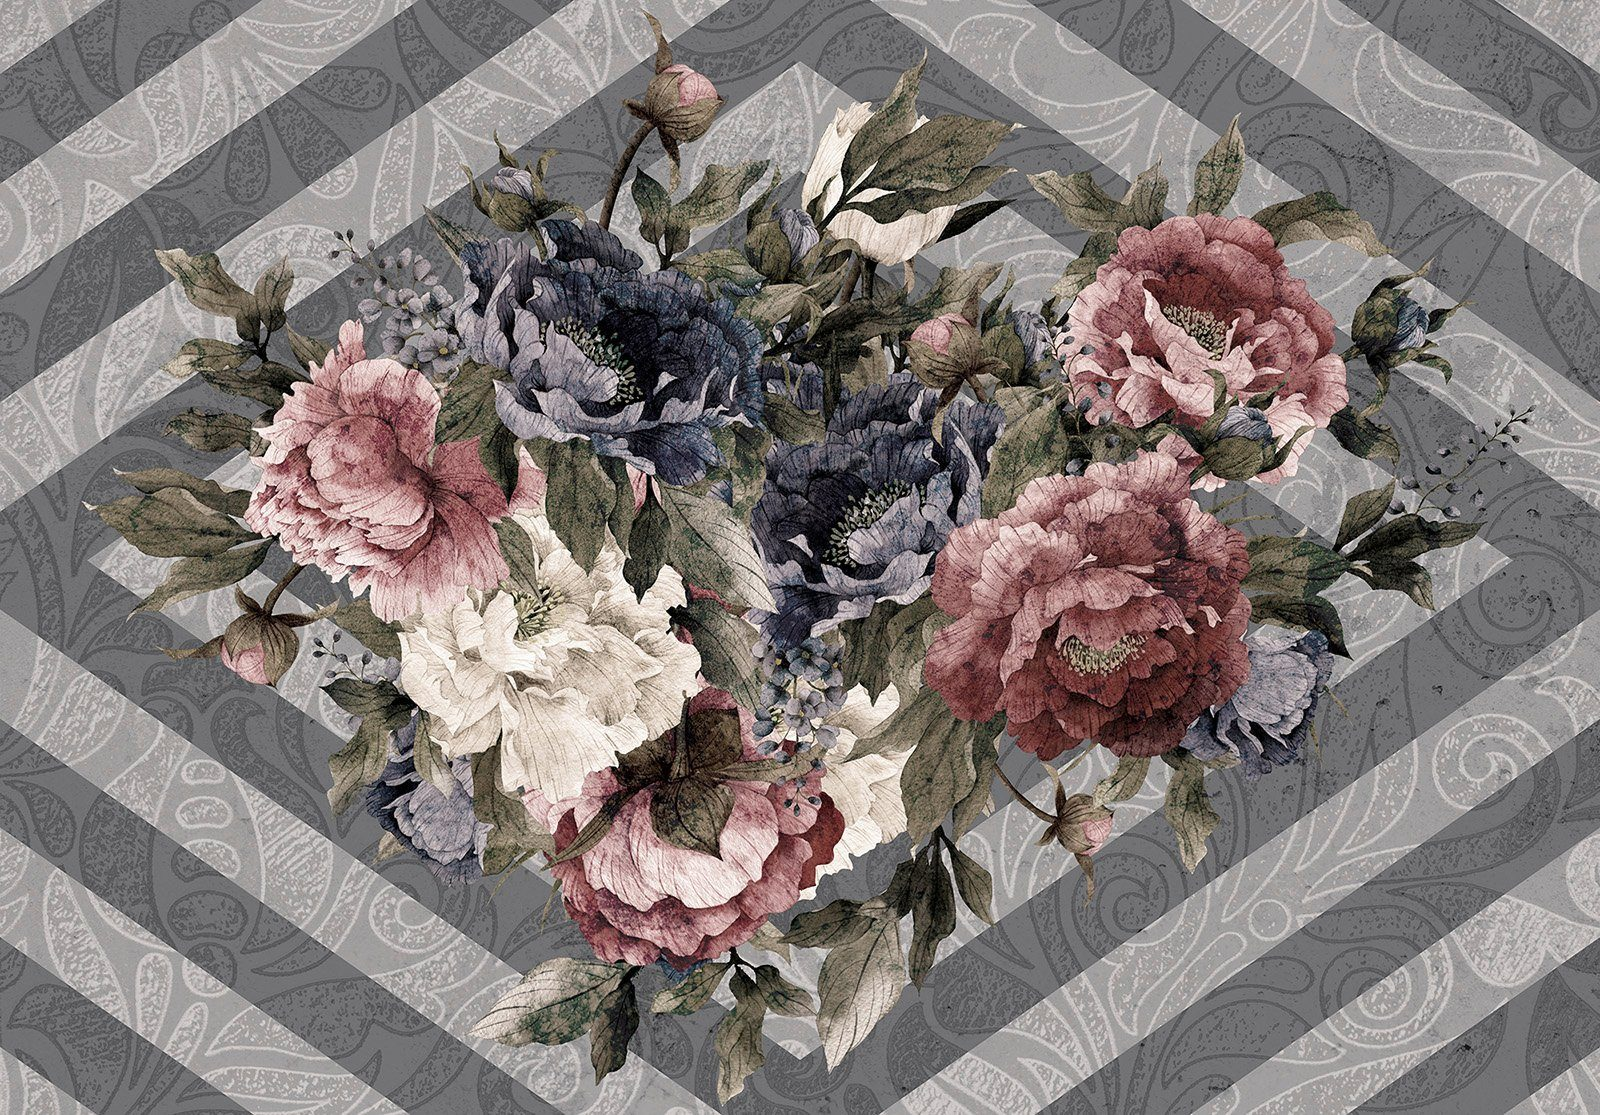 KPH Shining Flowers 36 Fotos 10x15 sort Minialbum softcover